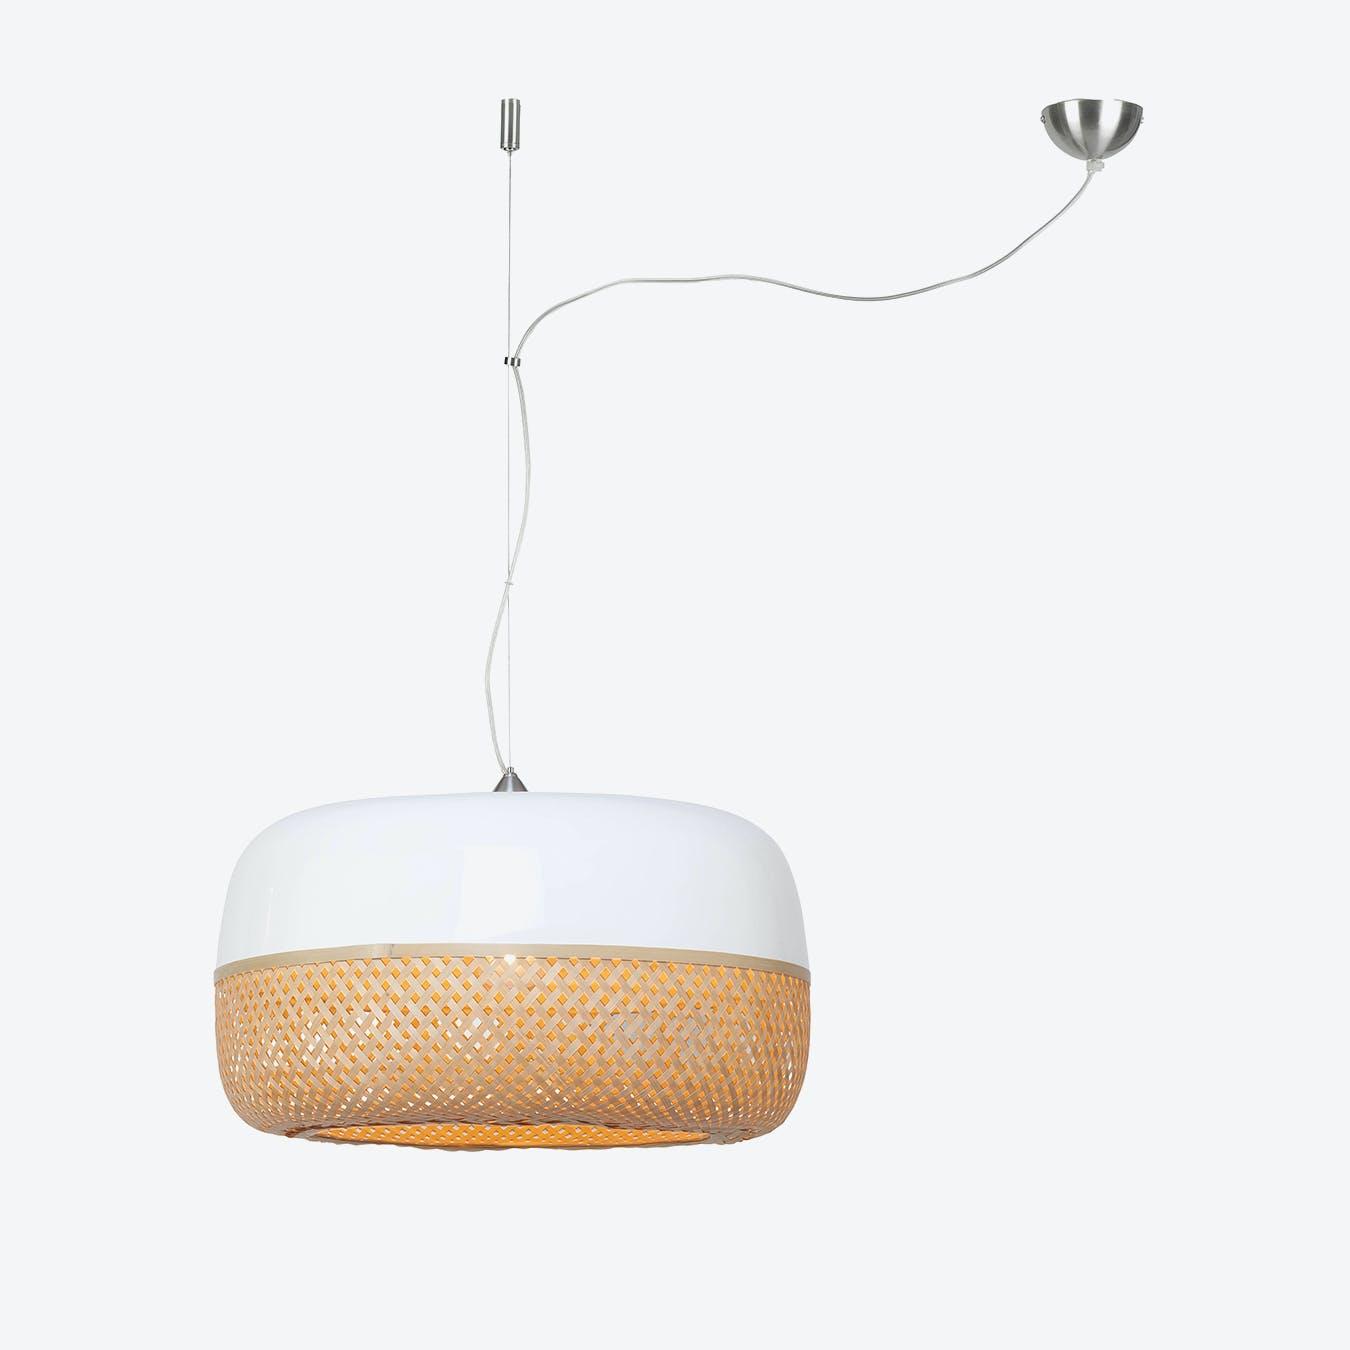 Mekong Single Pendant Lamp - Ø 60 cm